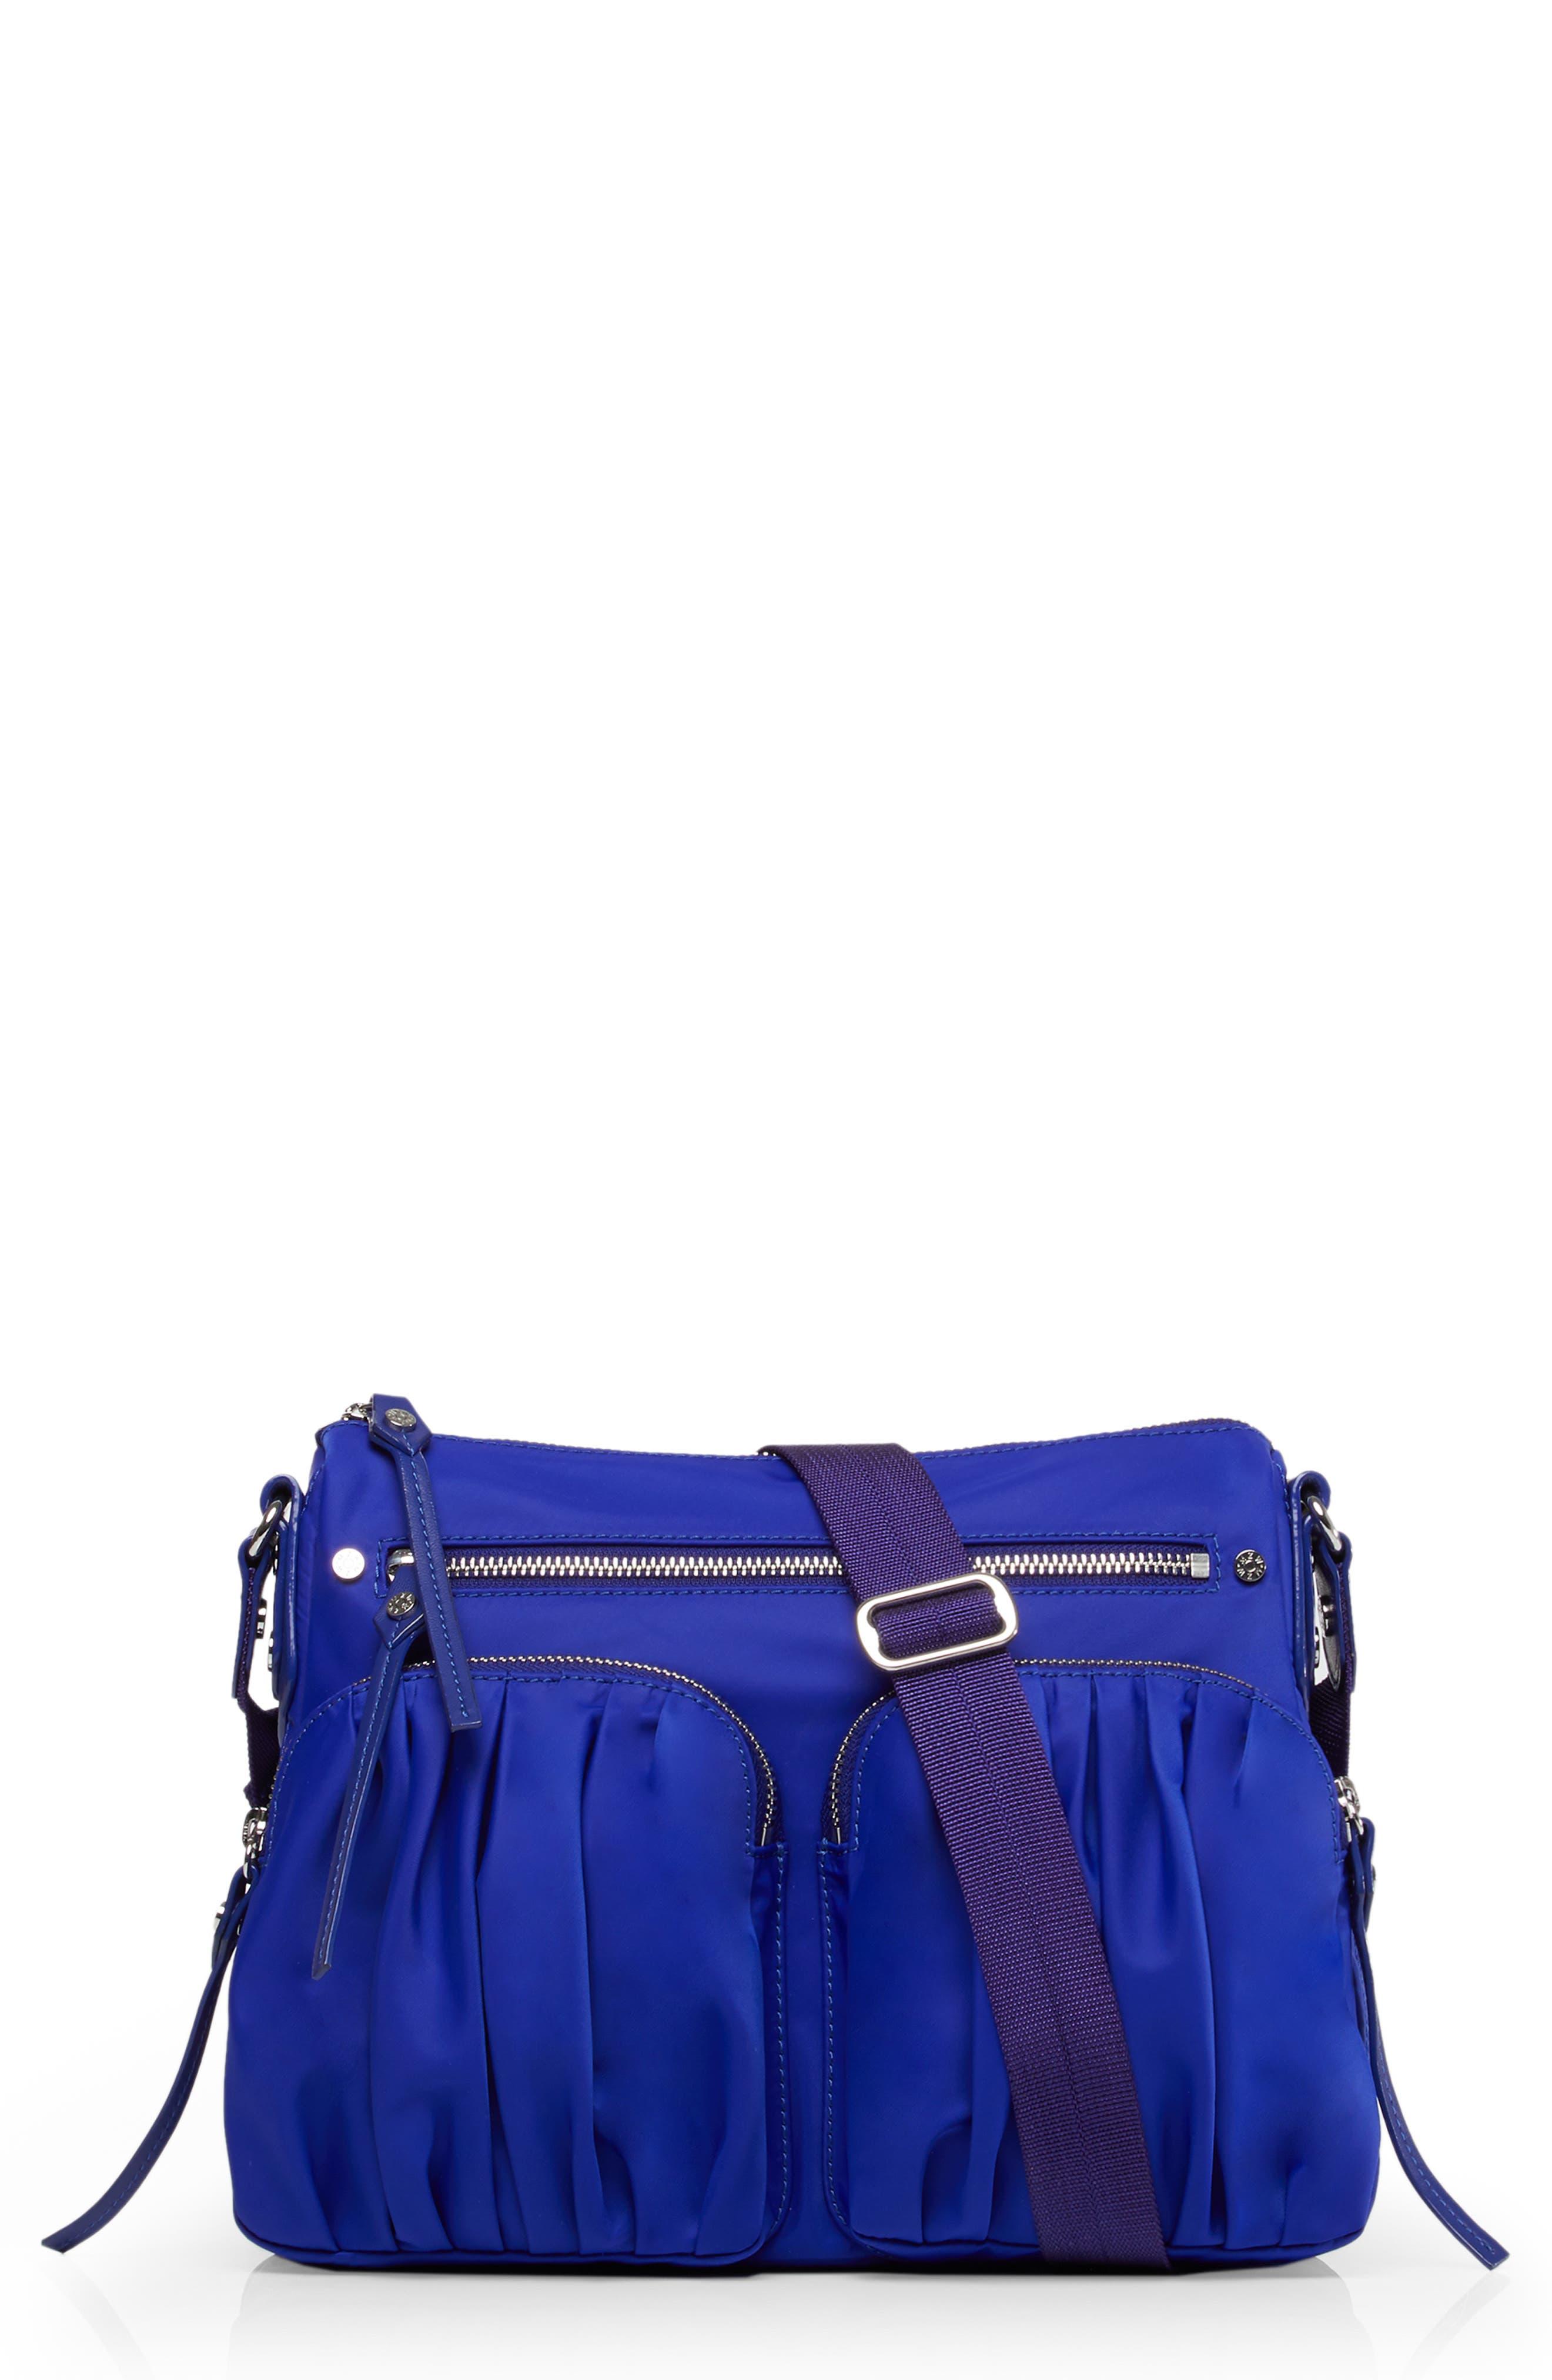 b1ad26ab2cf4 MZ Wallace Handbags